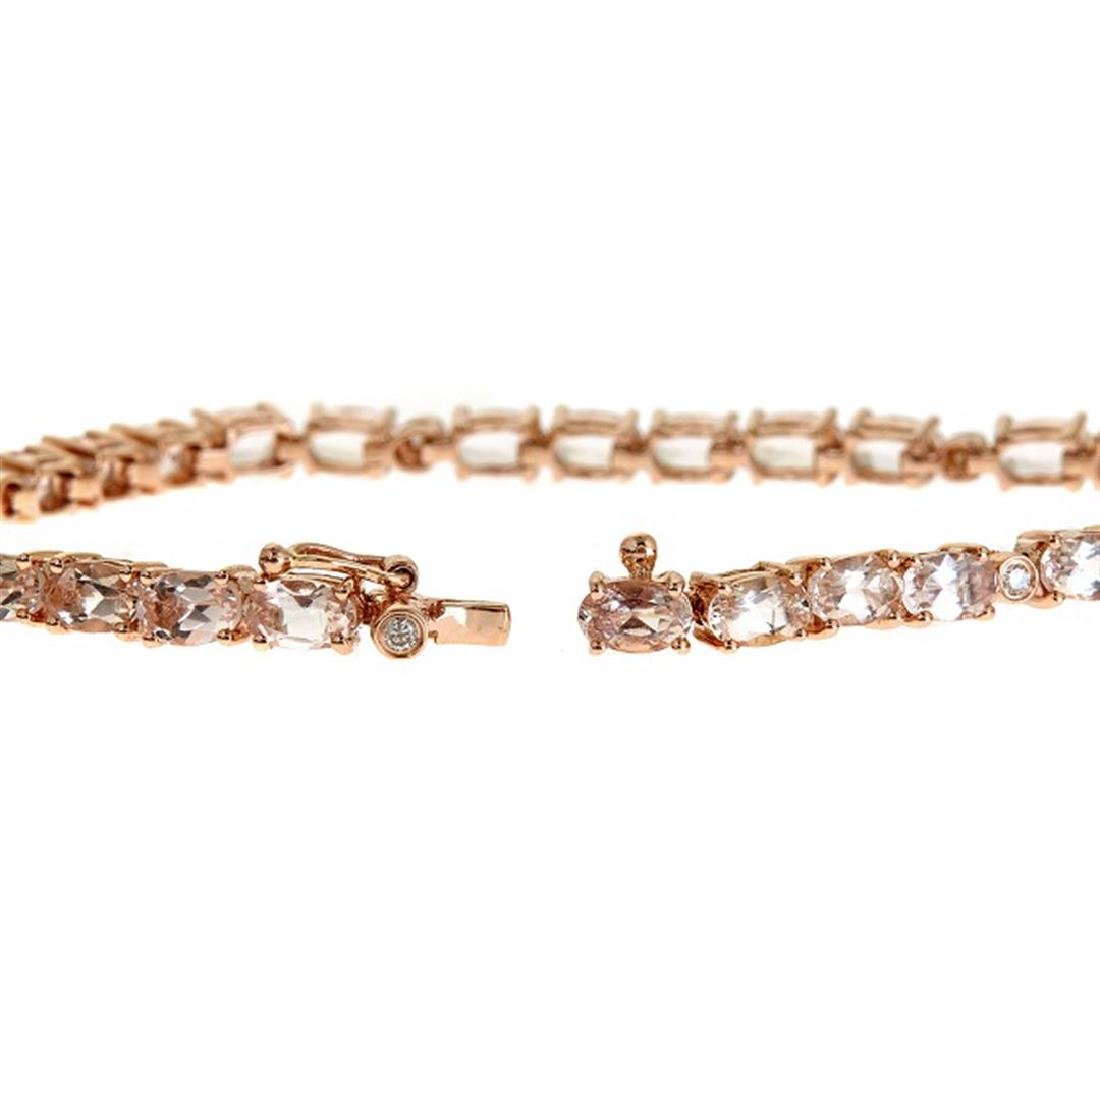 6.89 ctw Morganite and Diamond Bracelet - 14KT Rose - 2